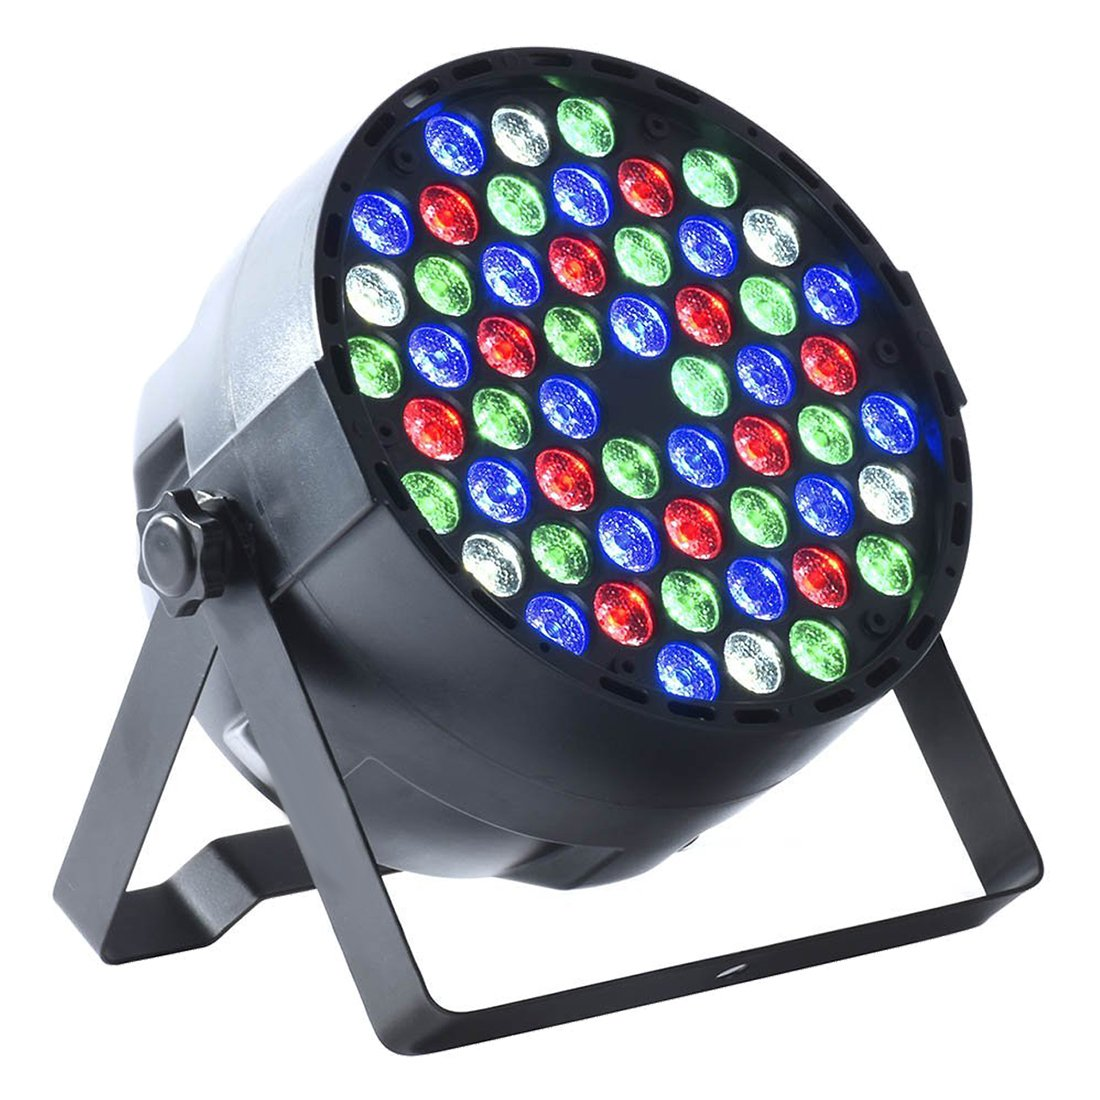 LED Stage Light - TOOGOO(R) 8 x DMX512 54X3W RGBW LED Stage Light